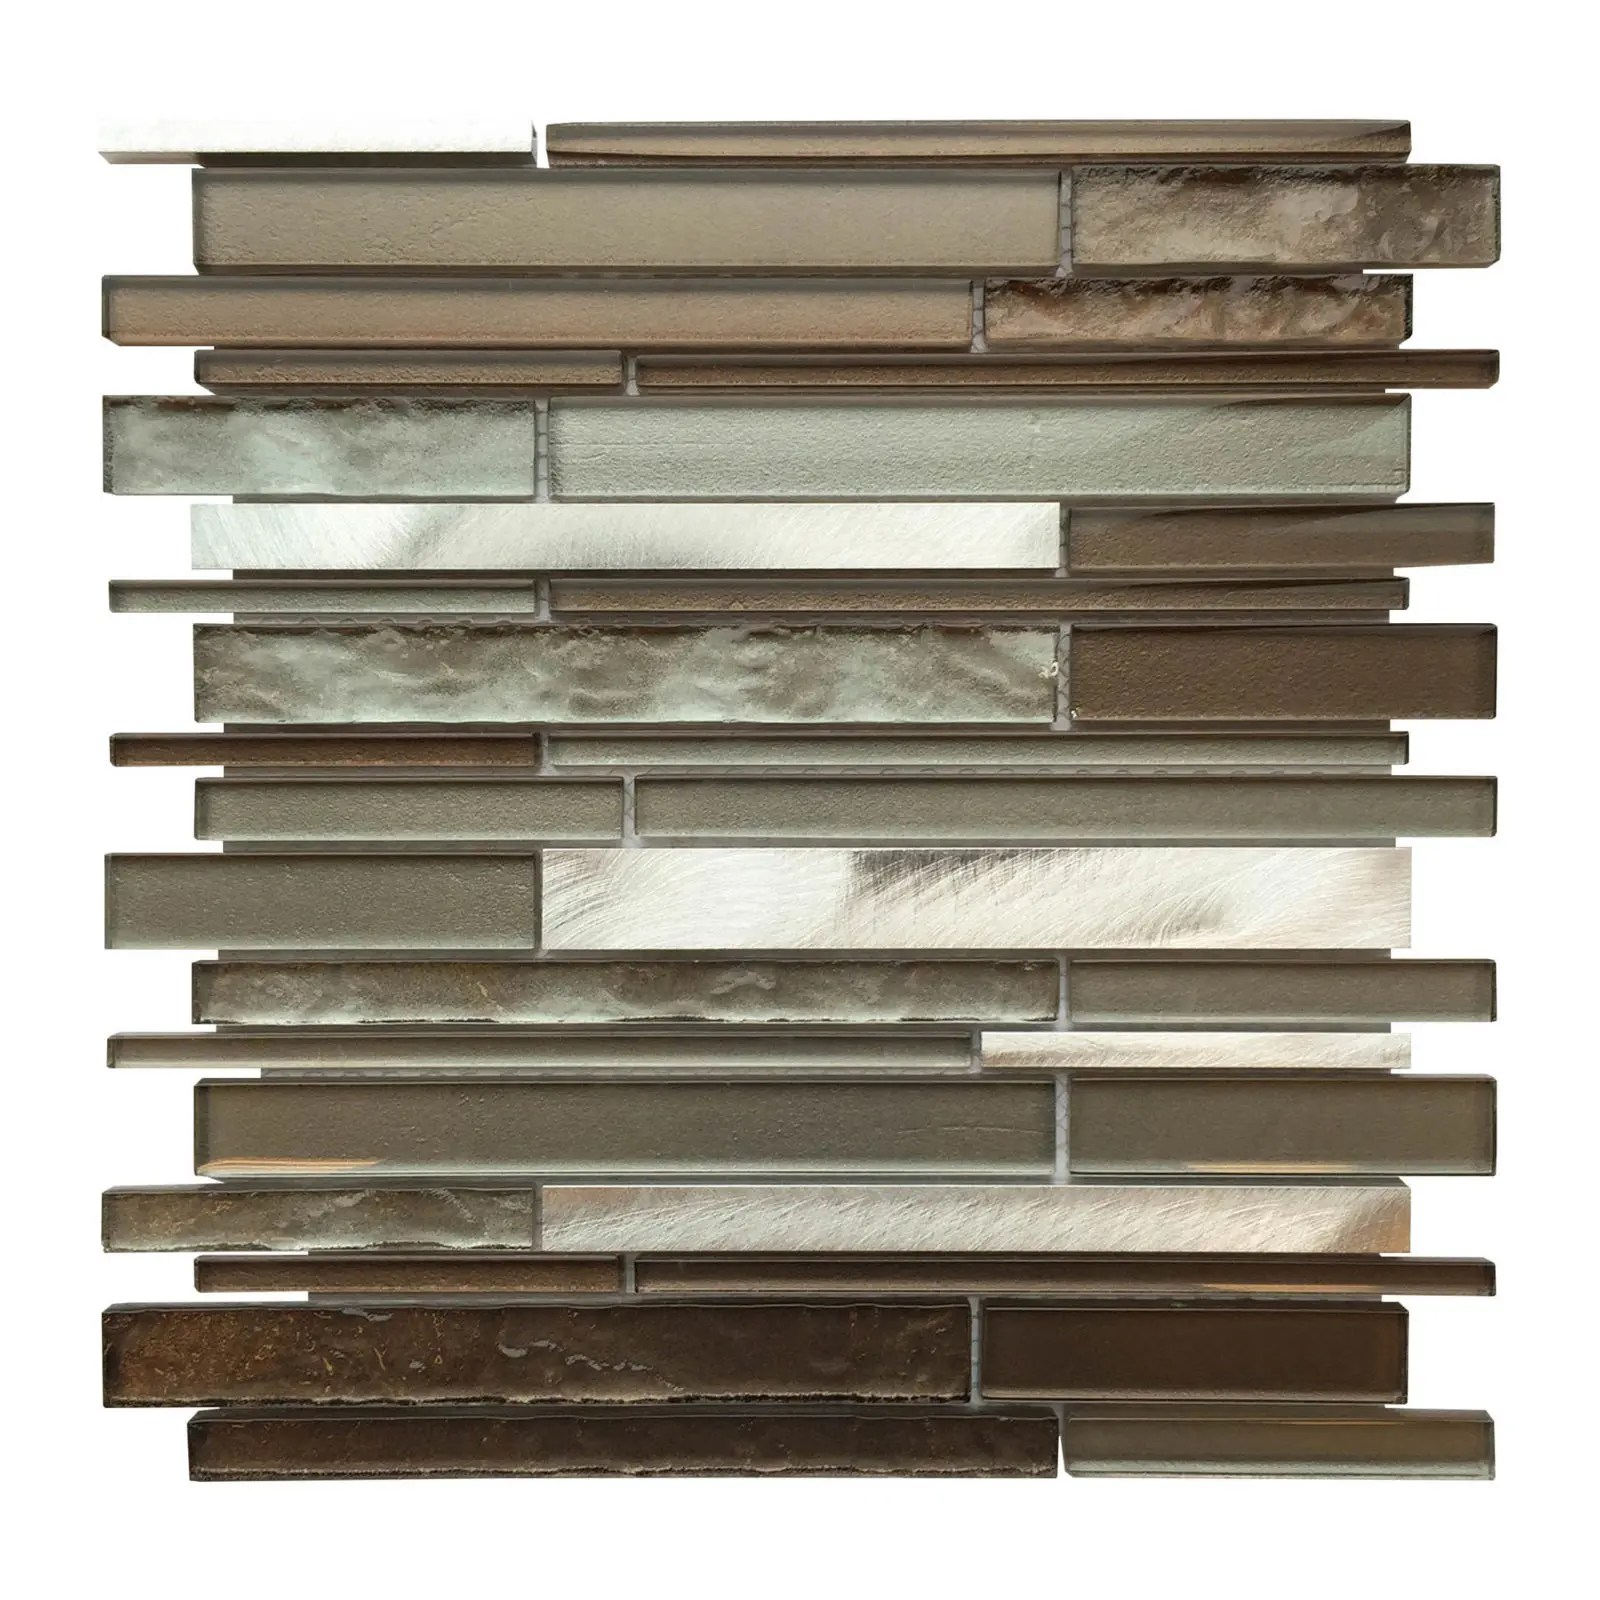 al3300 glass tile and stone strip mosaic backsplash